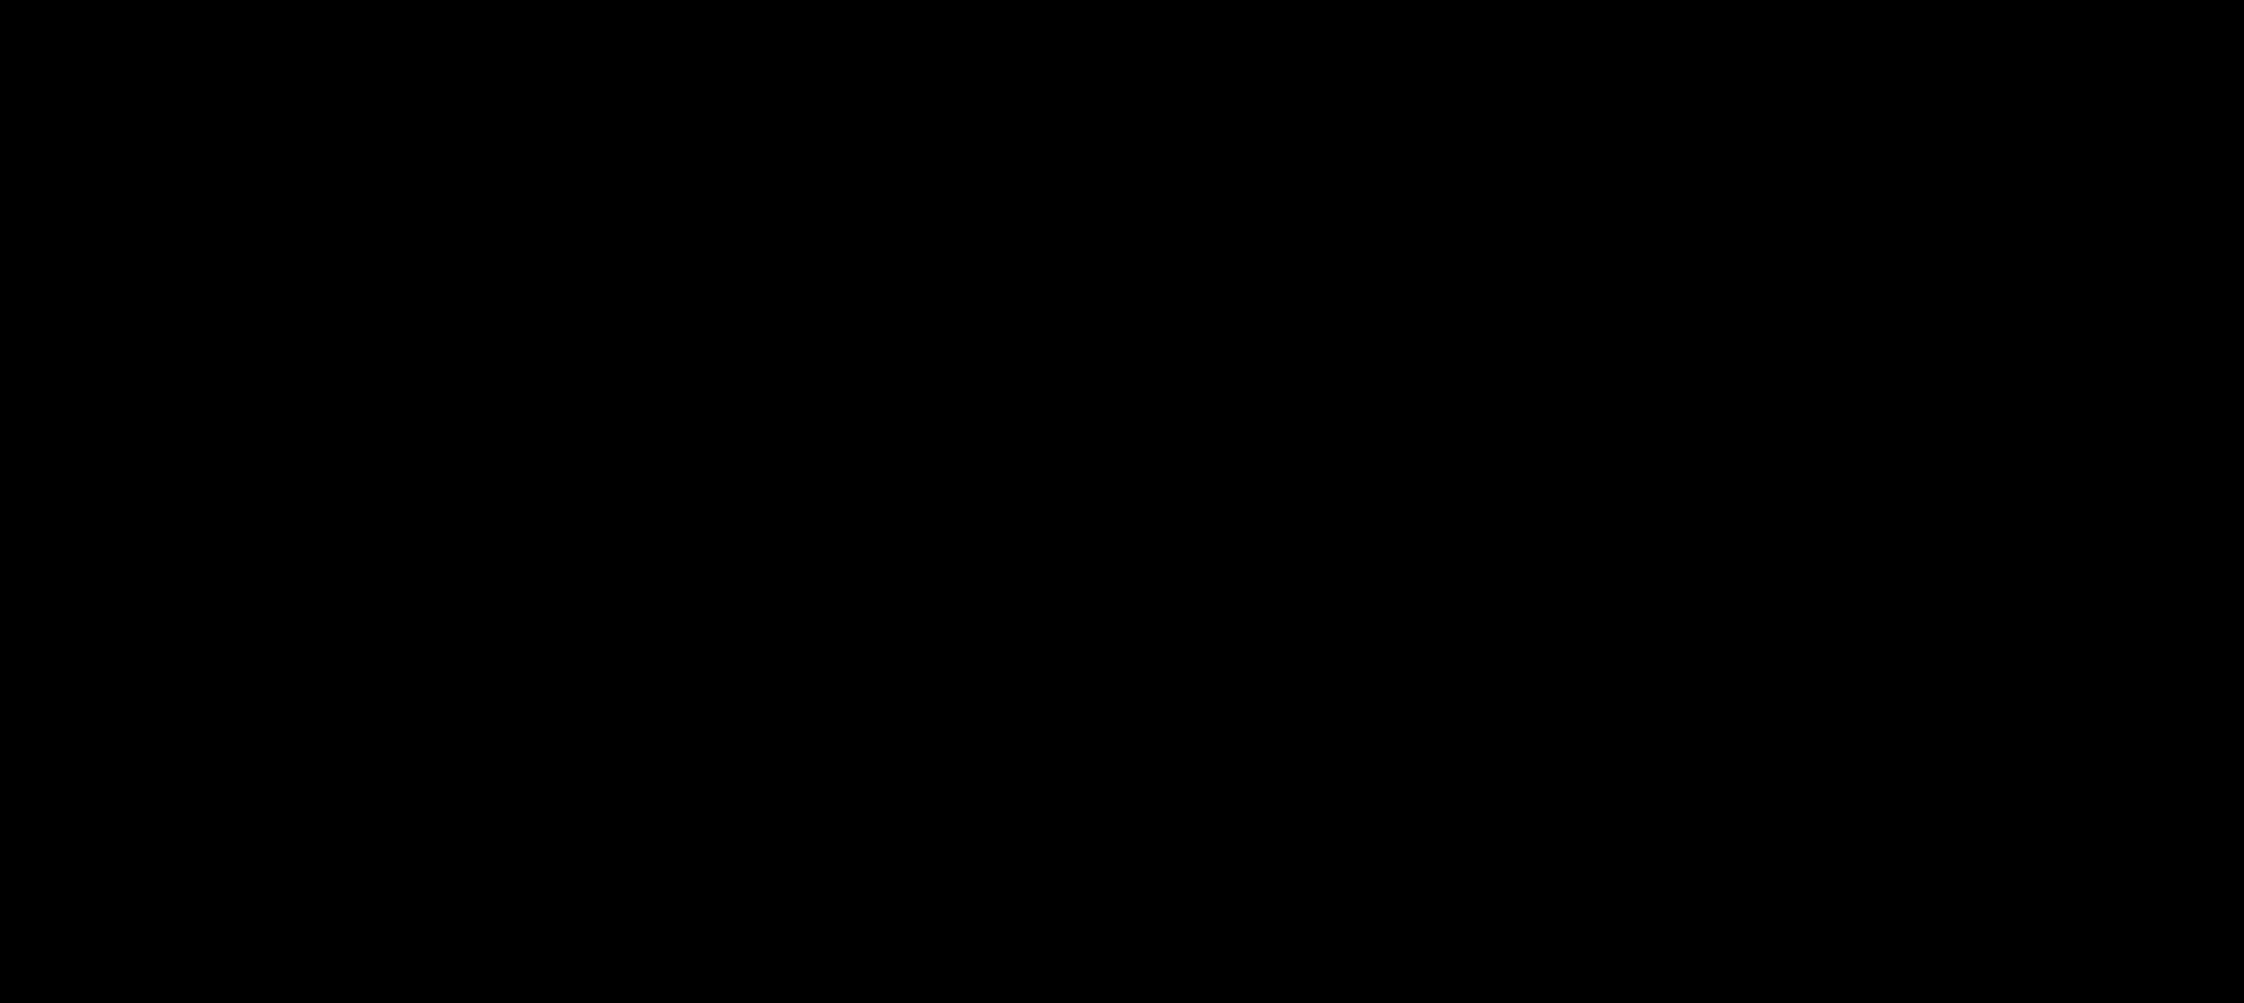 Dara Sekar Signature